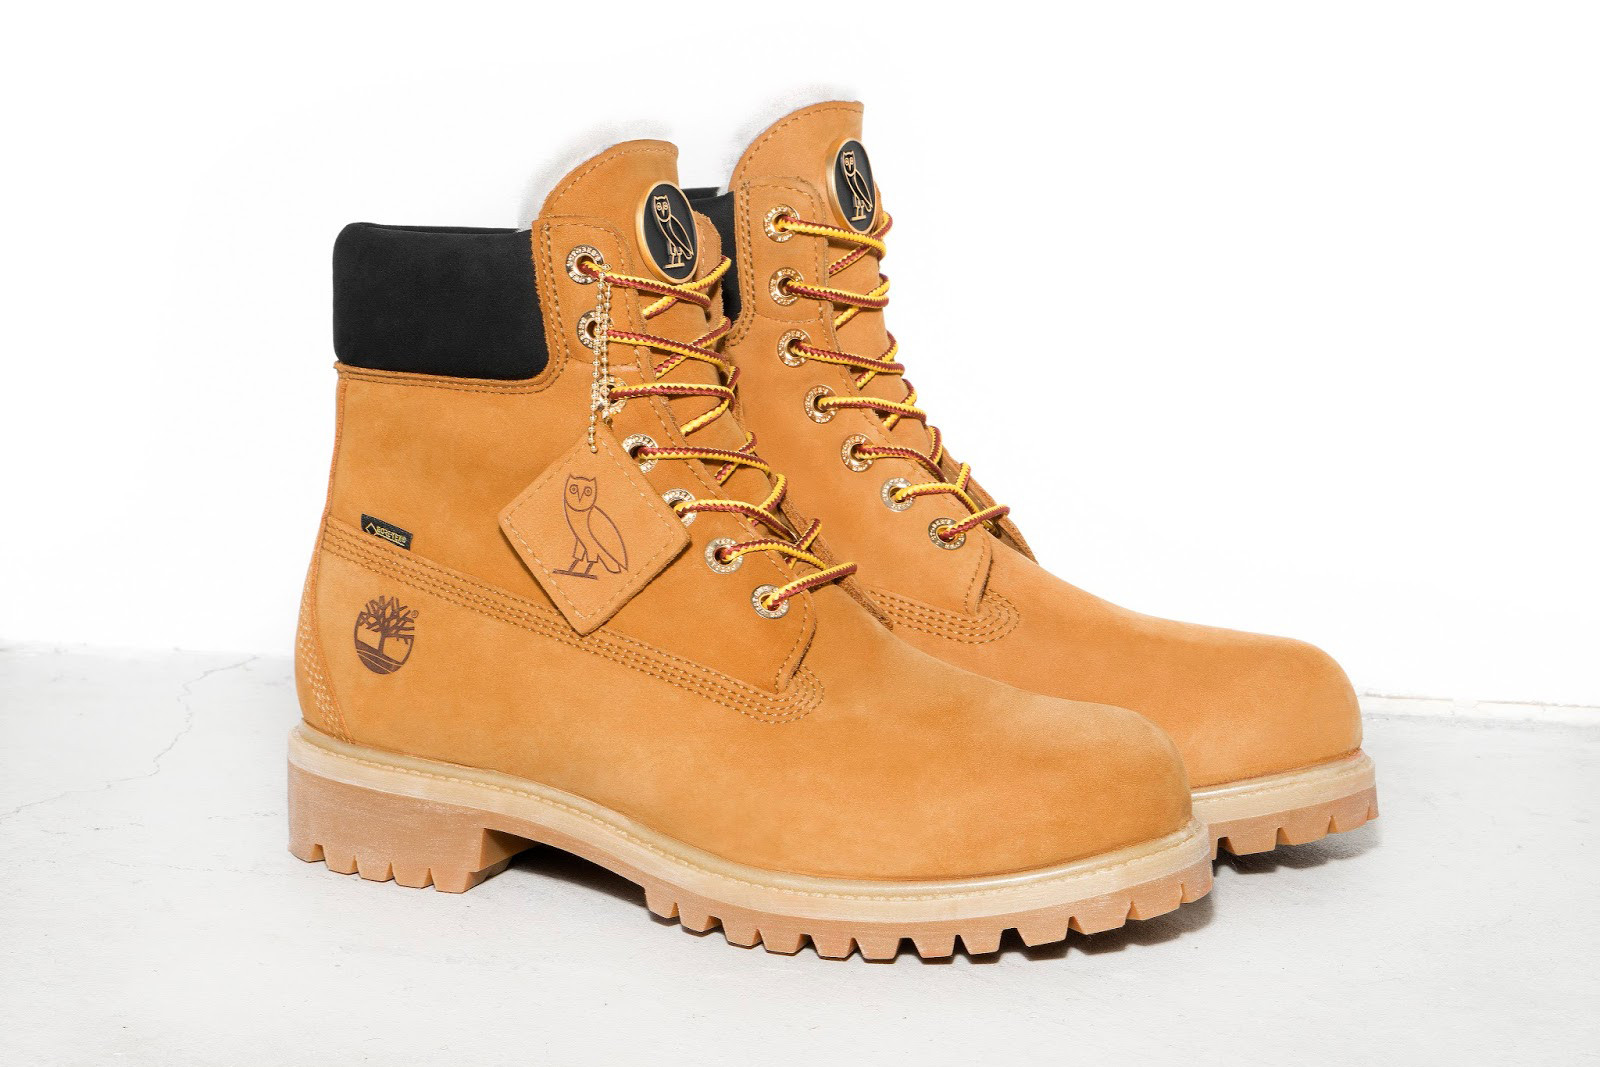 OVO x Timberland 6-Inch Boots Wheat